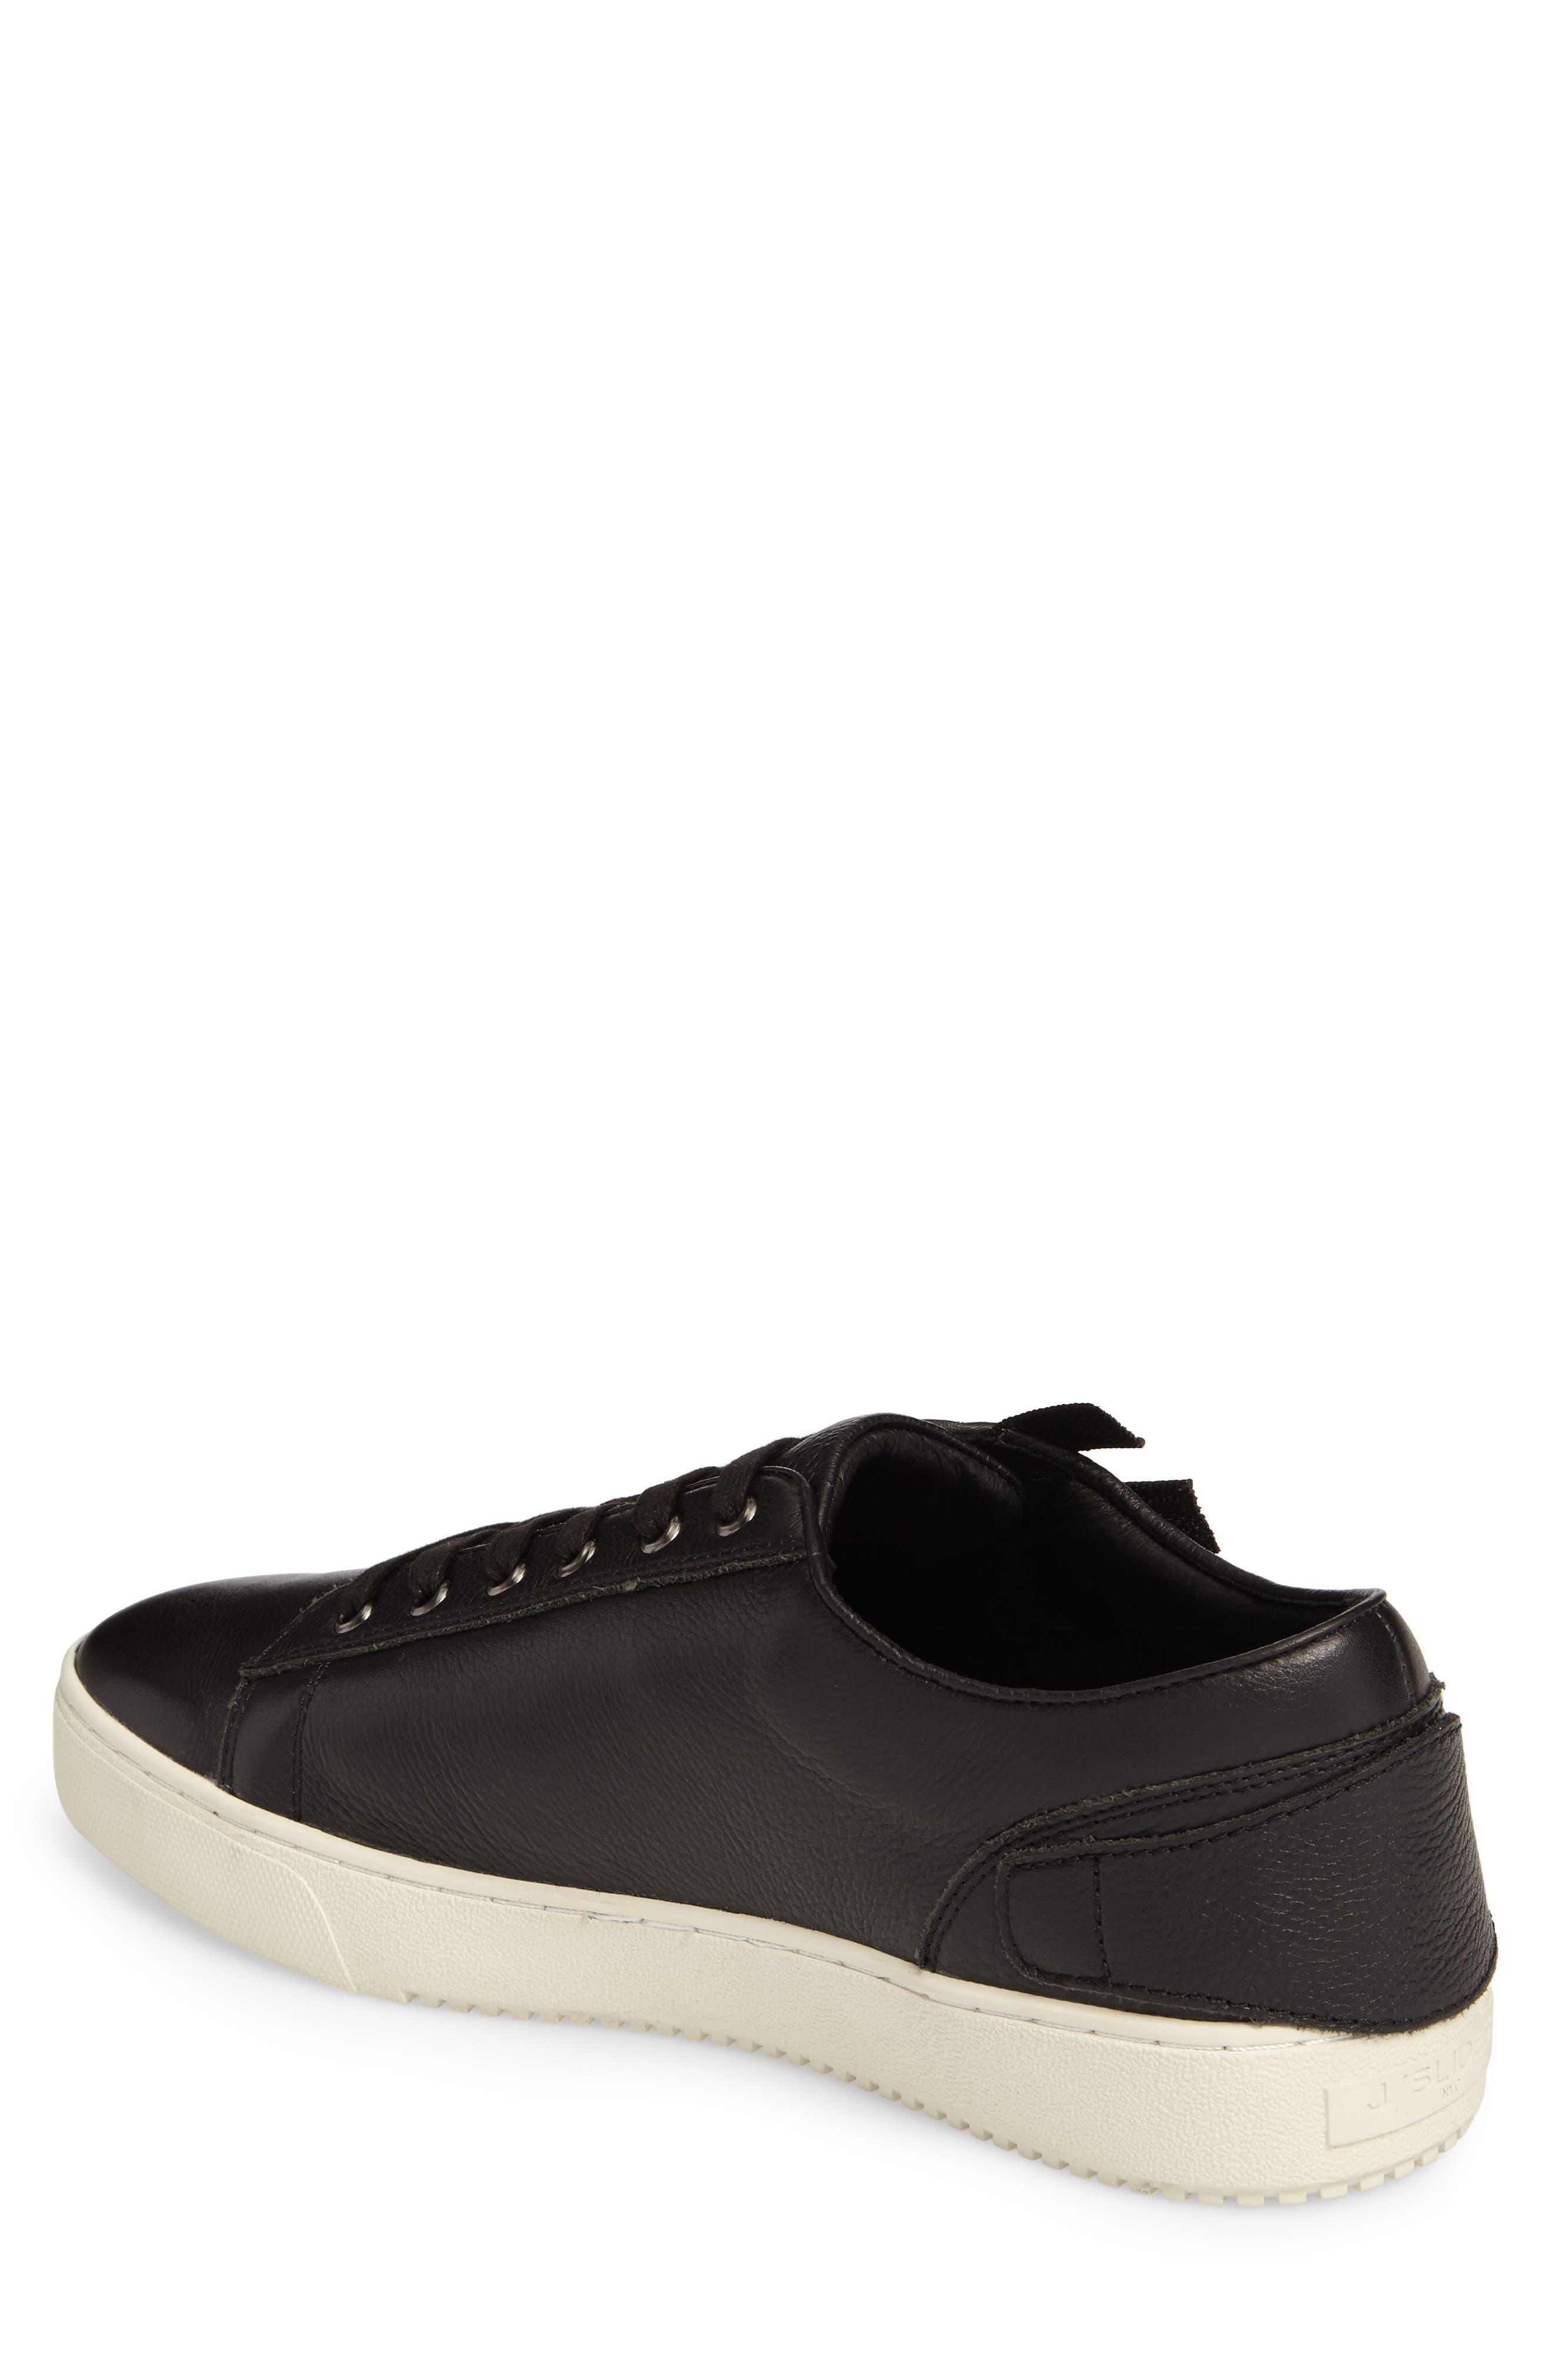 Wayne Sneaker,                             Alternate thumbnail 2, color,                             BLACK LEATHER